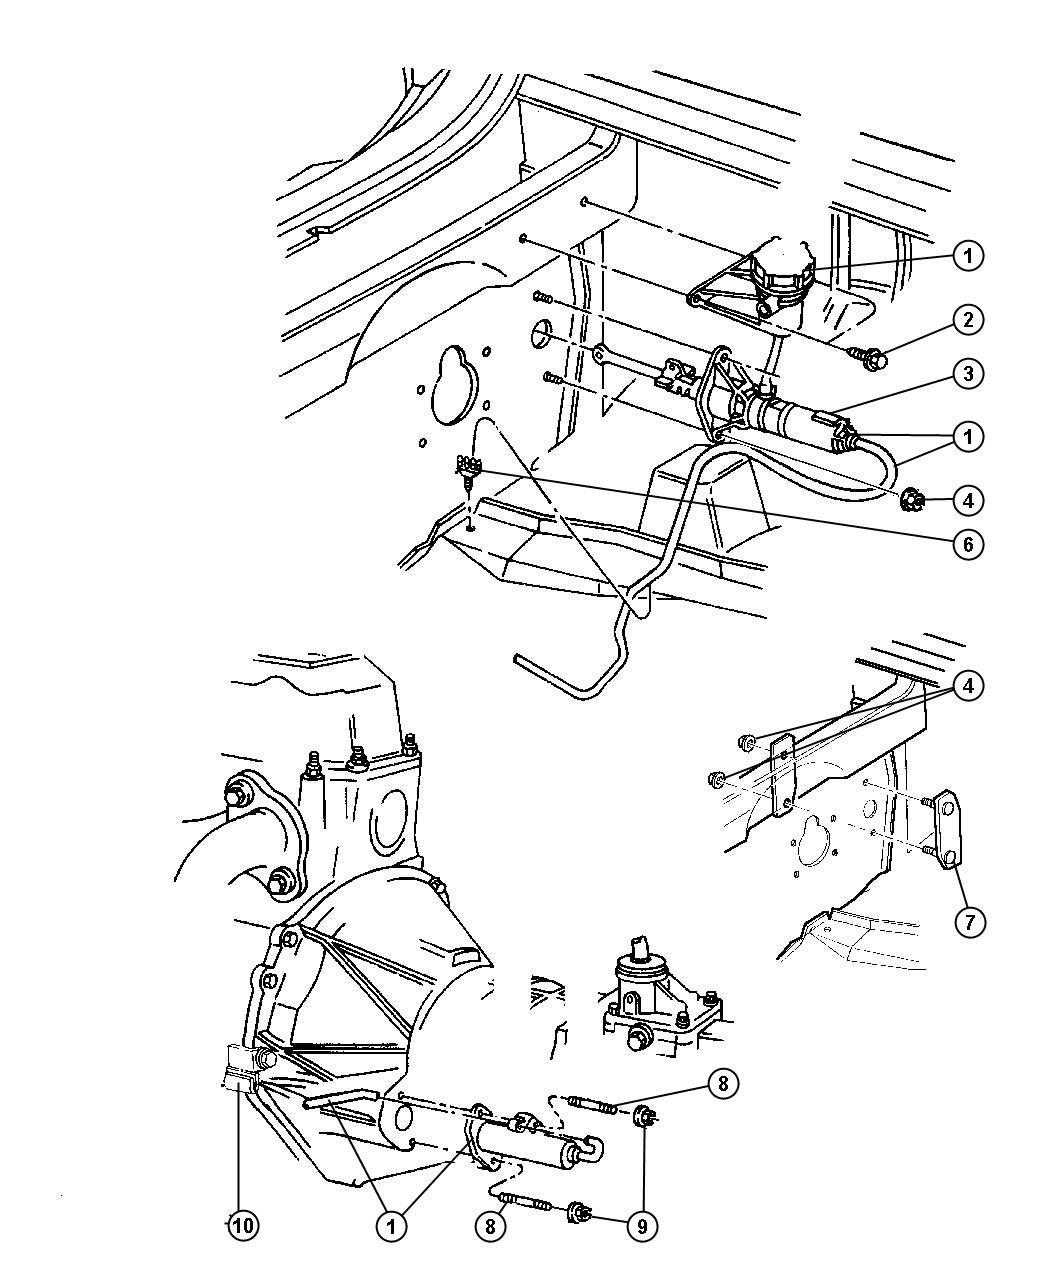 1994 Dodge Dakota Switch. Clutch starter interlock. [13